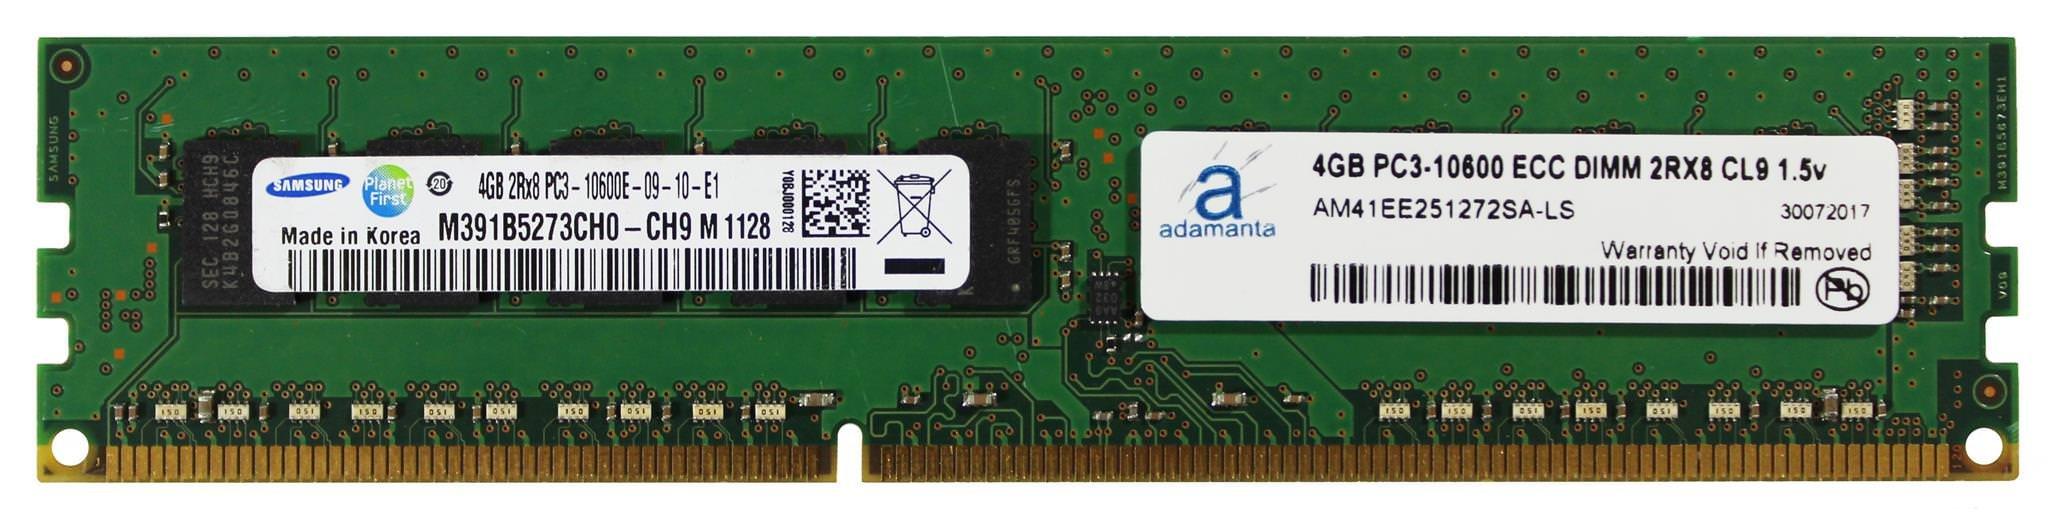 Memoria RAM 4GB Adamanta (1x4GB) Server Upgrade para Servers DDR3 1333MHz PC3-10600 ECC Unbuffered 2Rx8 CL9 1.5v DRAM